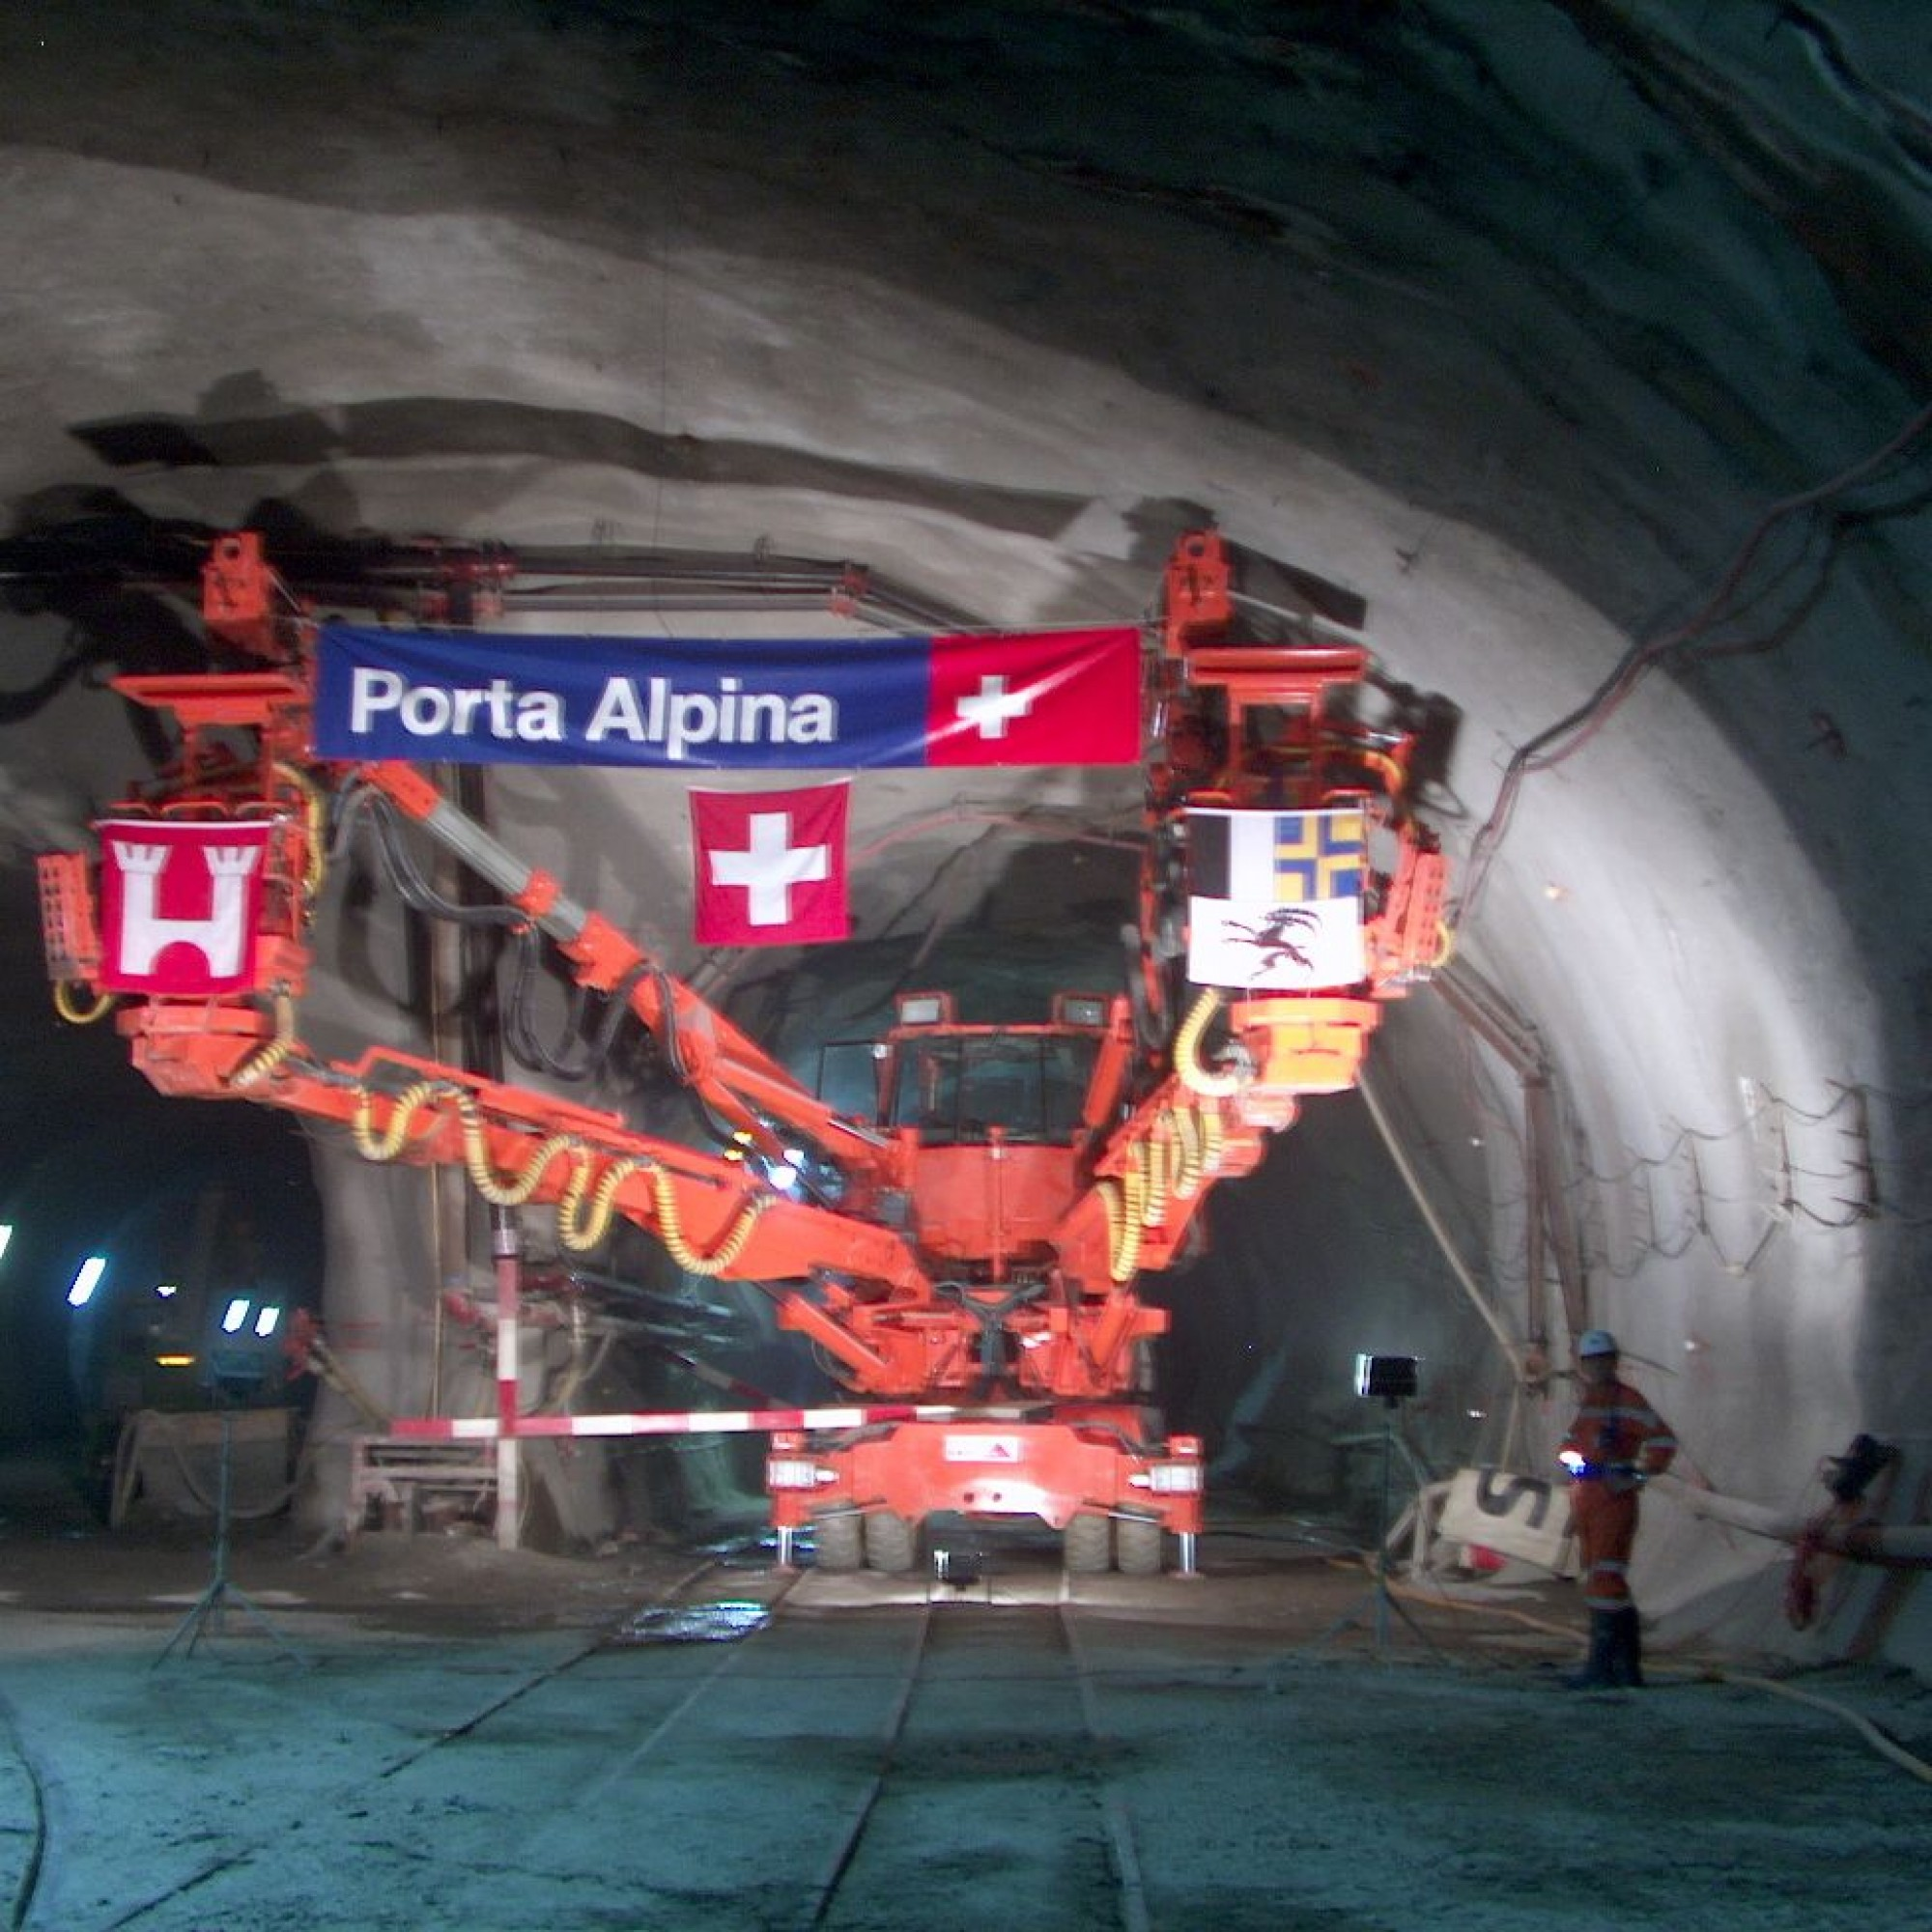 Anschlagsfeier Porta Alpina